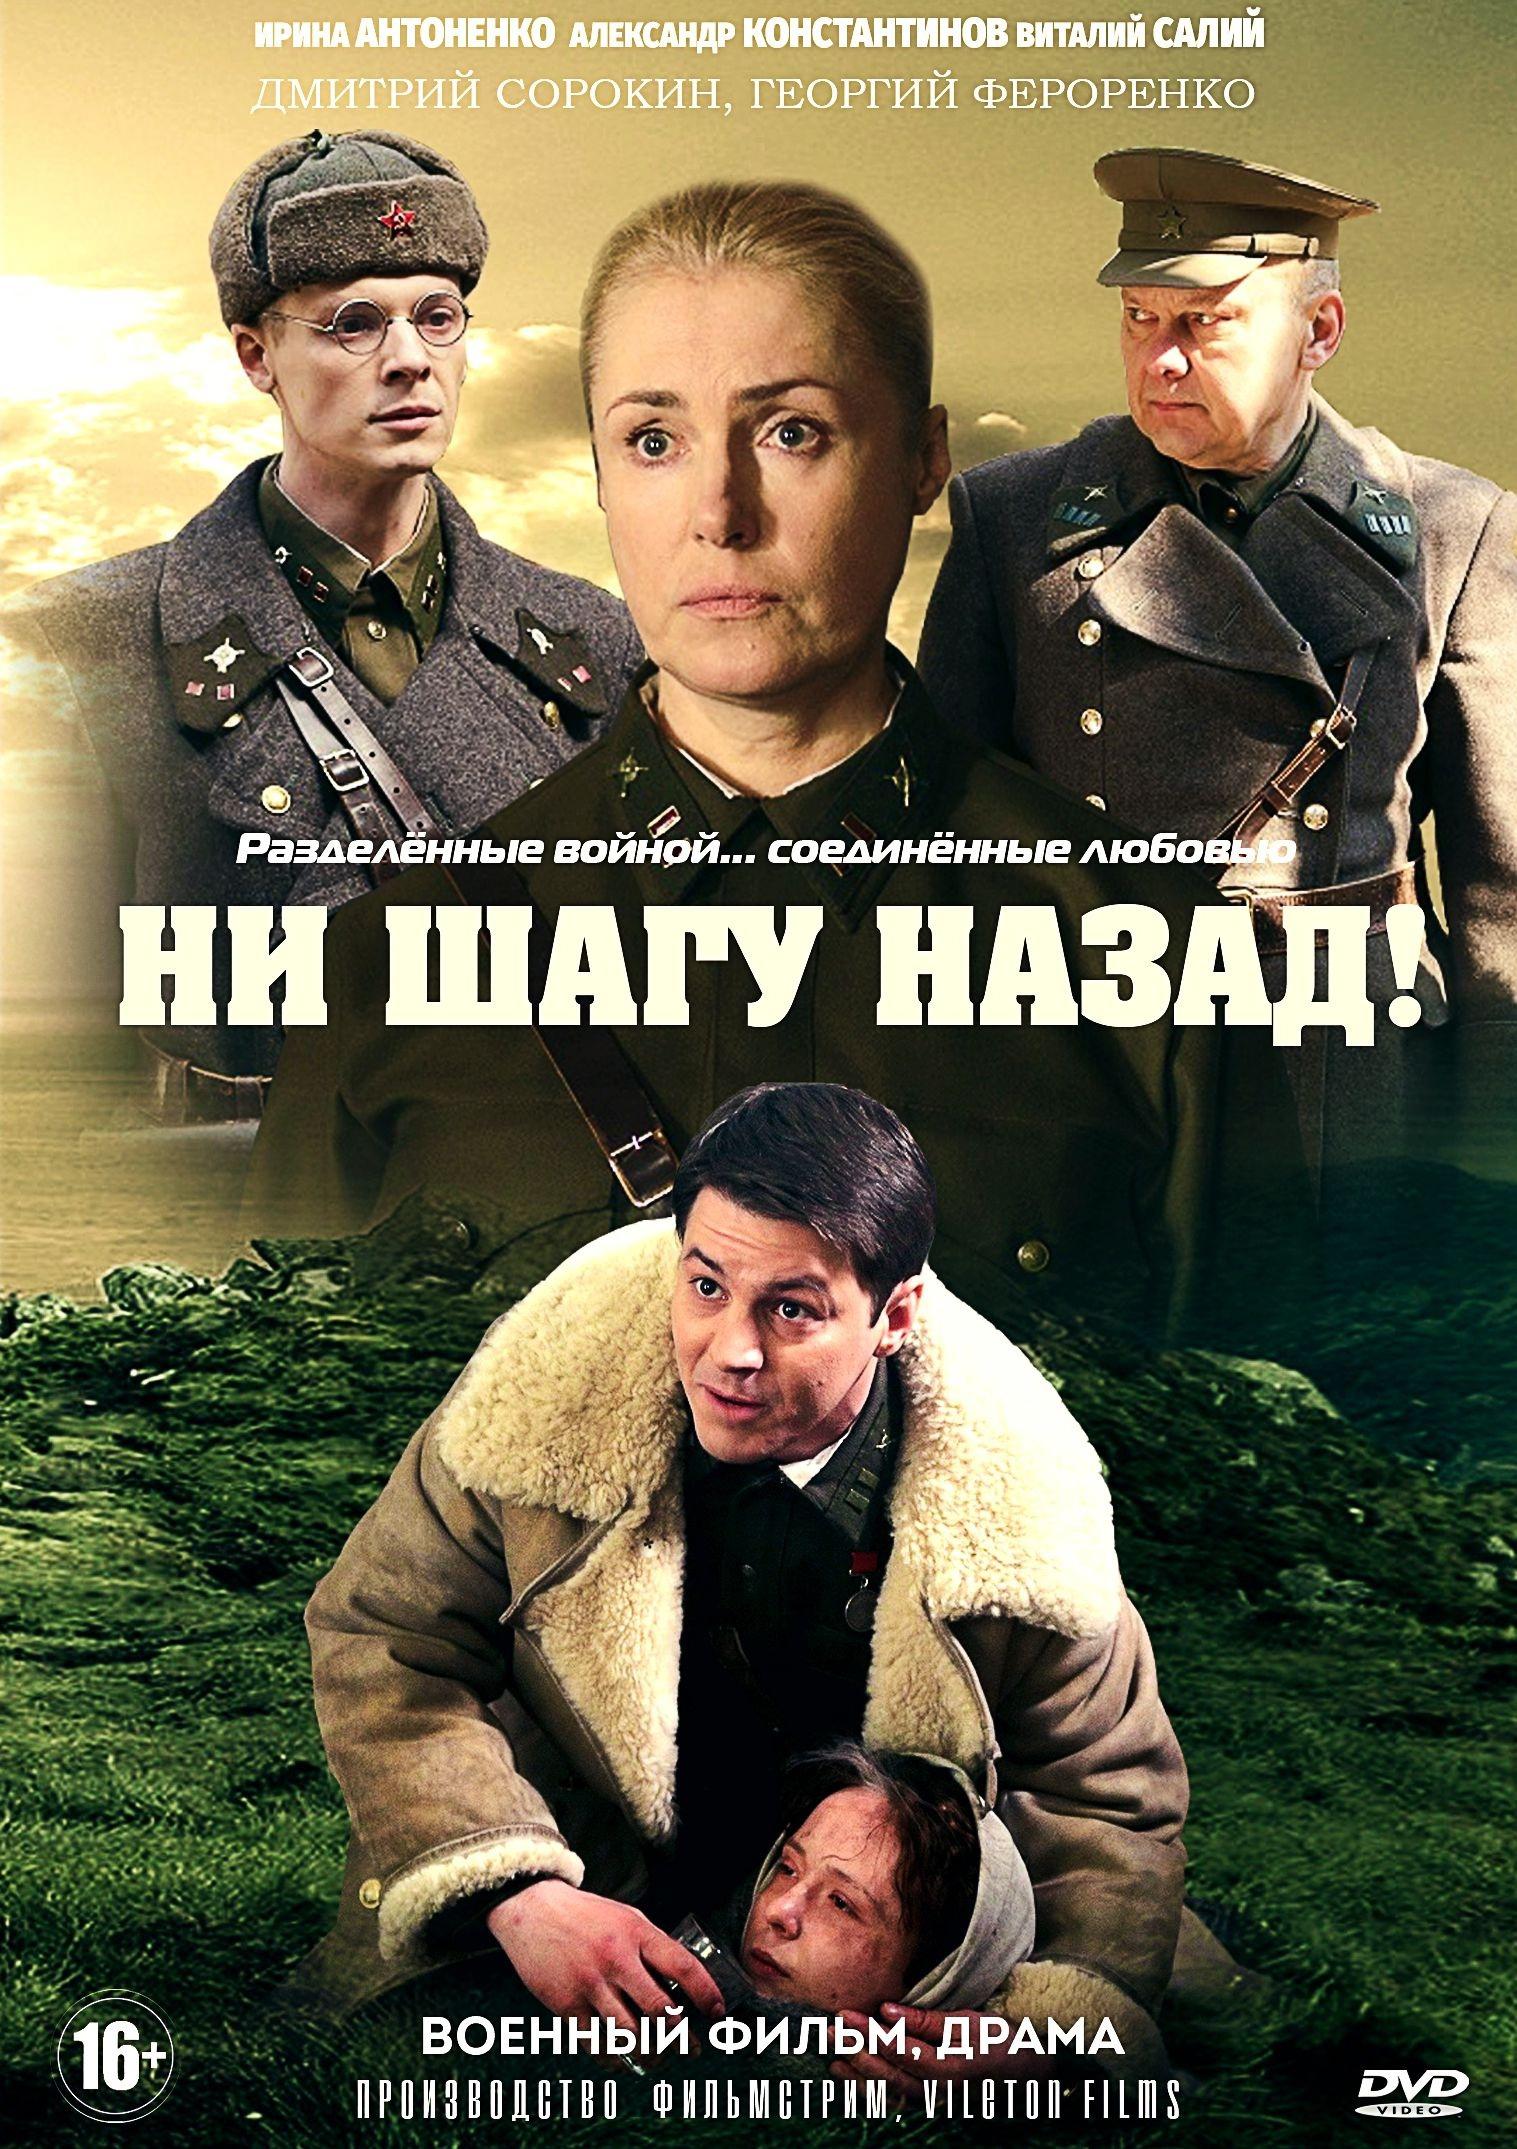 Военная драма «Hи шaгy нaзaд / Hи шaгy нaзaд 2» (2019 - 2020) 1-12 серия из 12 HD